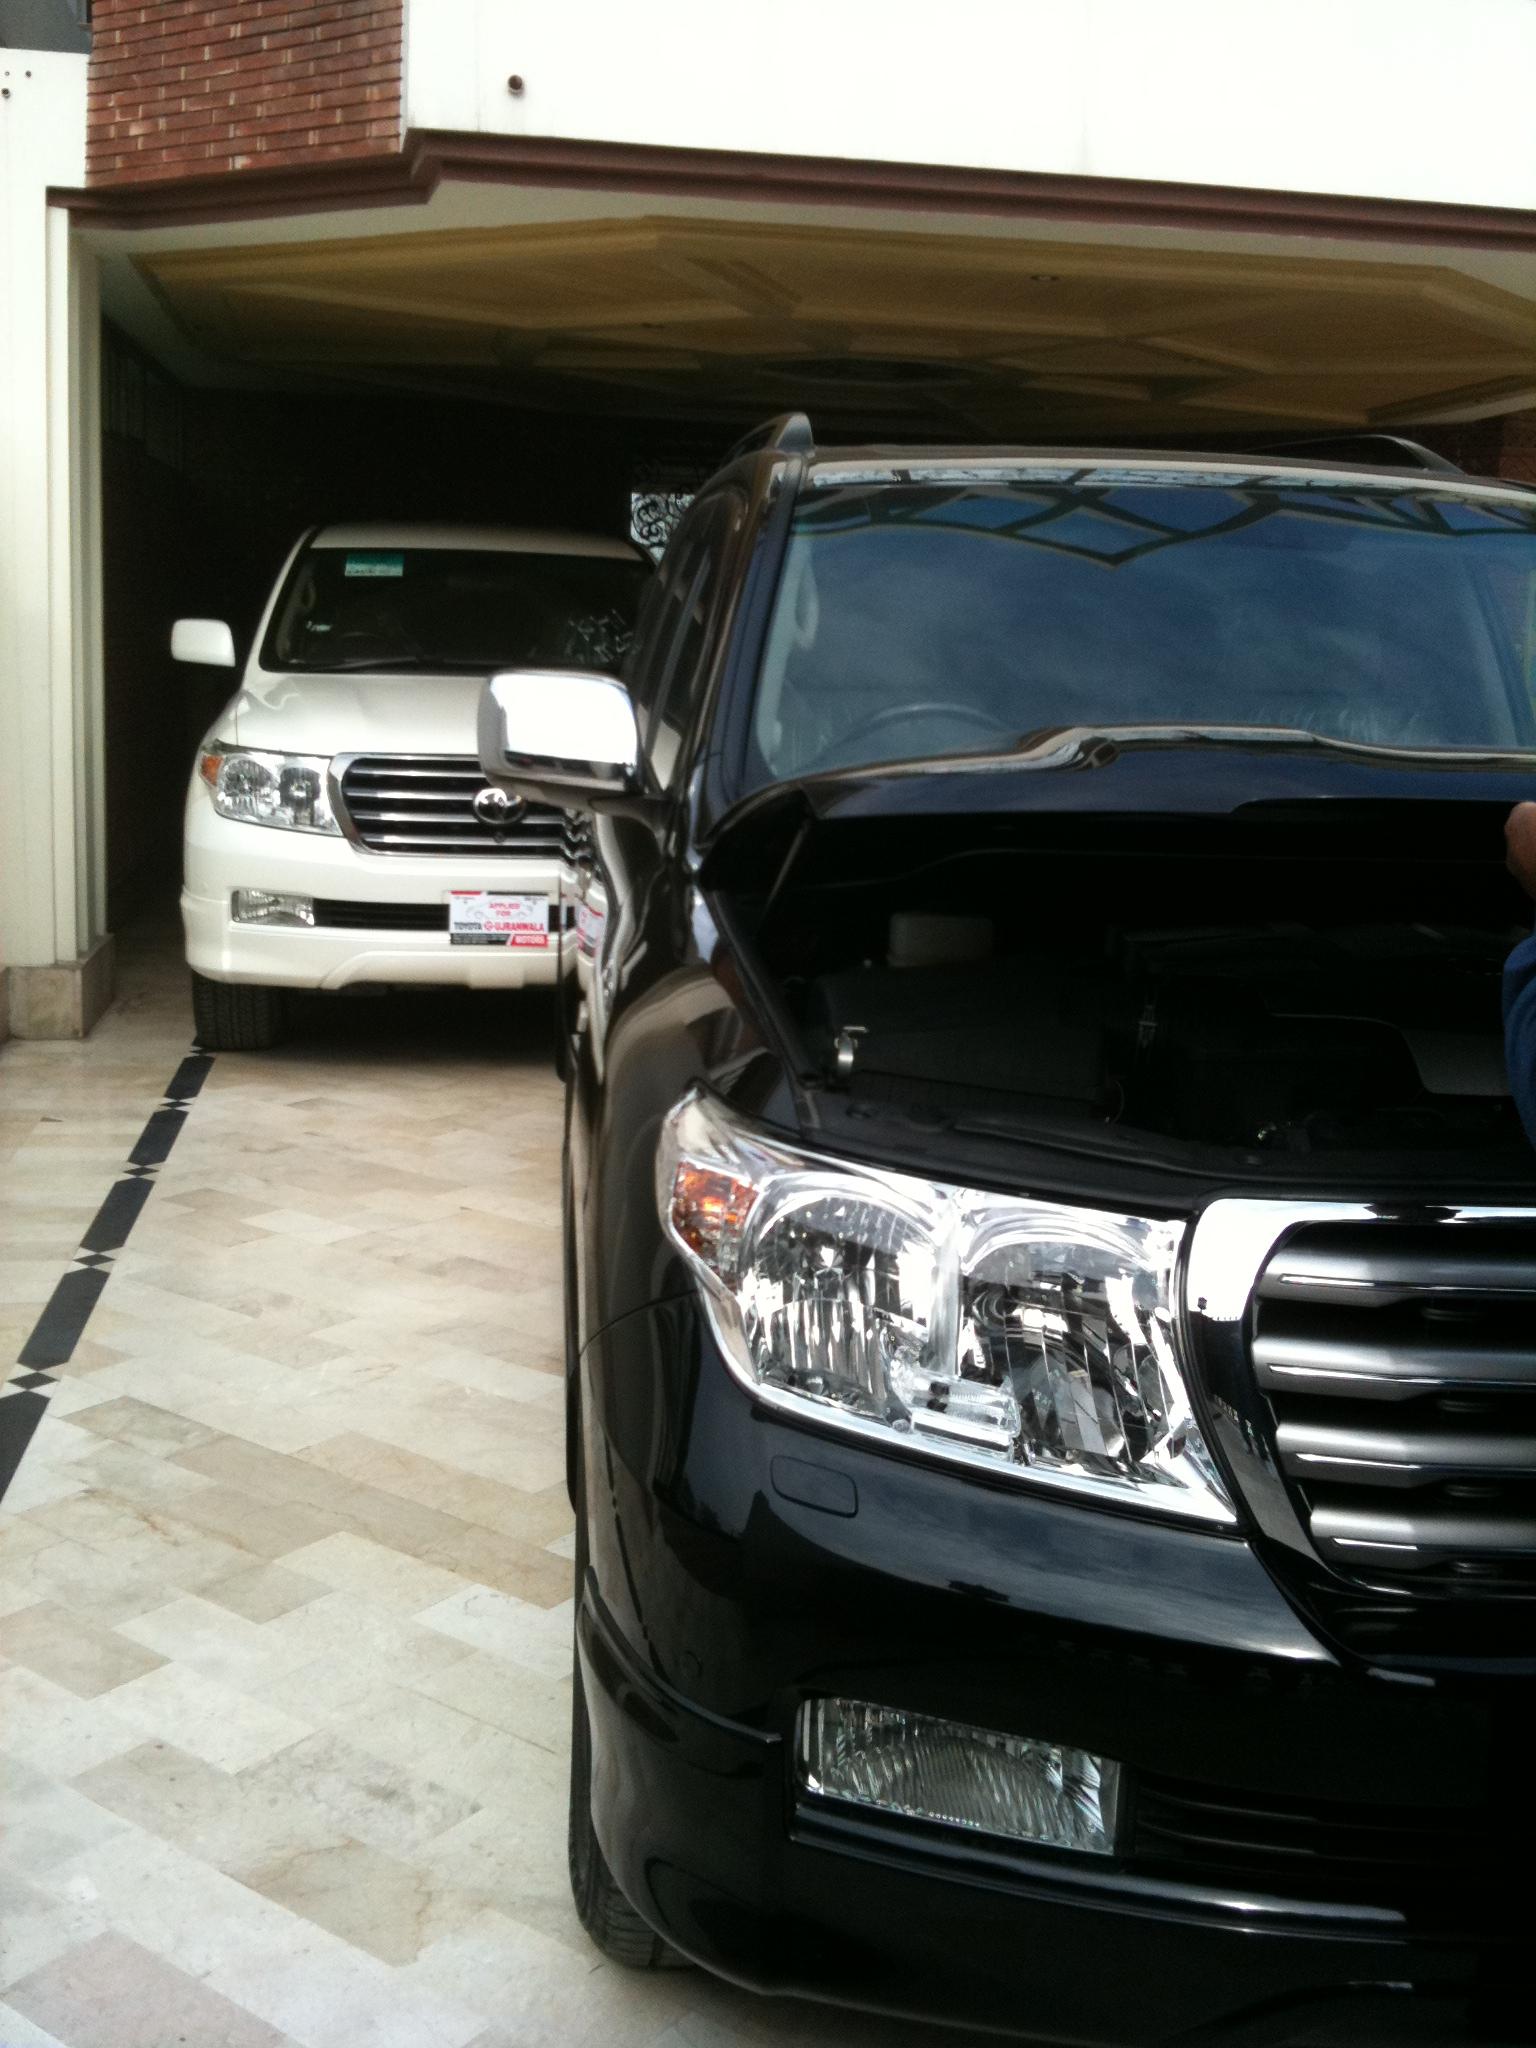 Toyota Land Cruiser - 2010 BL@CK B3@ST ND WH!T3 B3@UTY Image-1